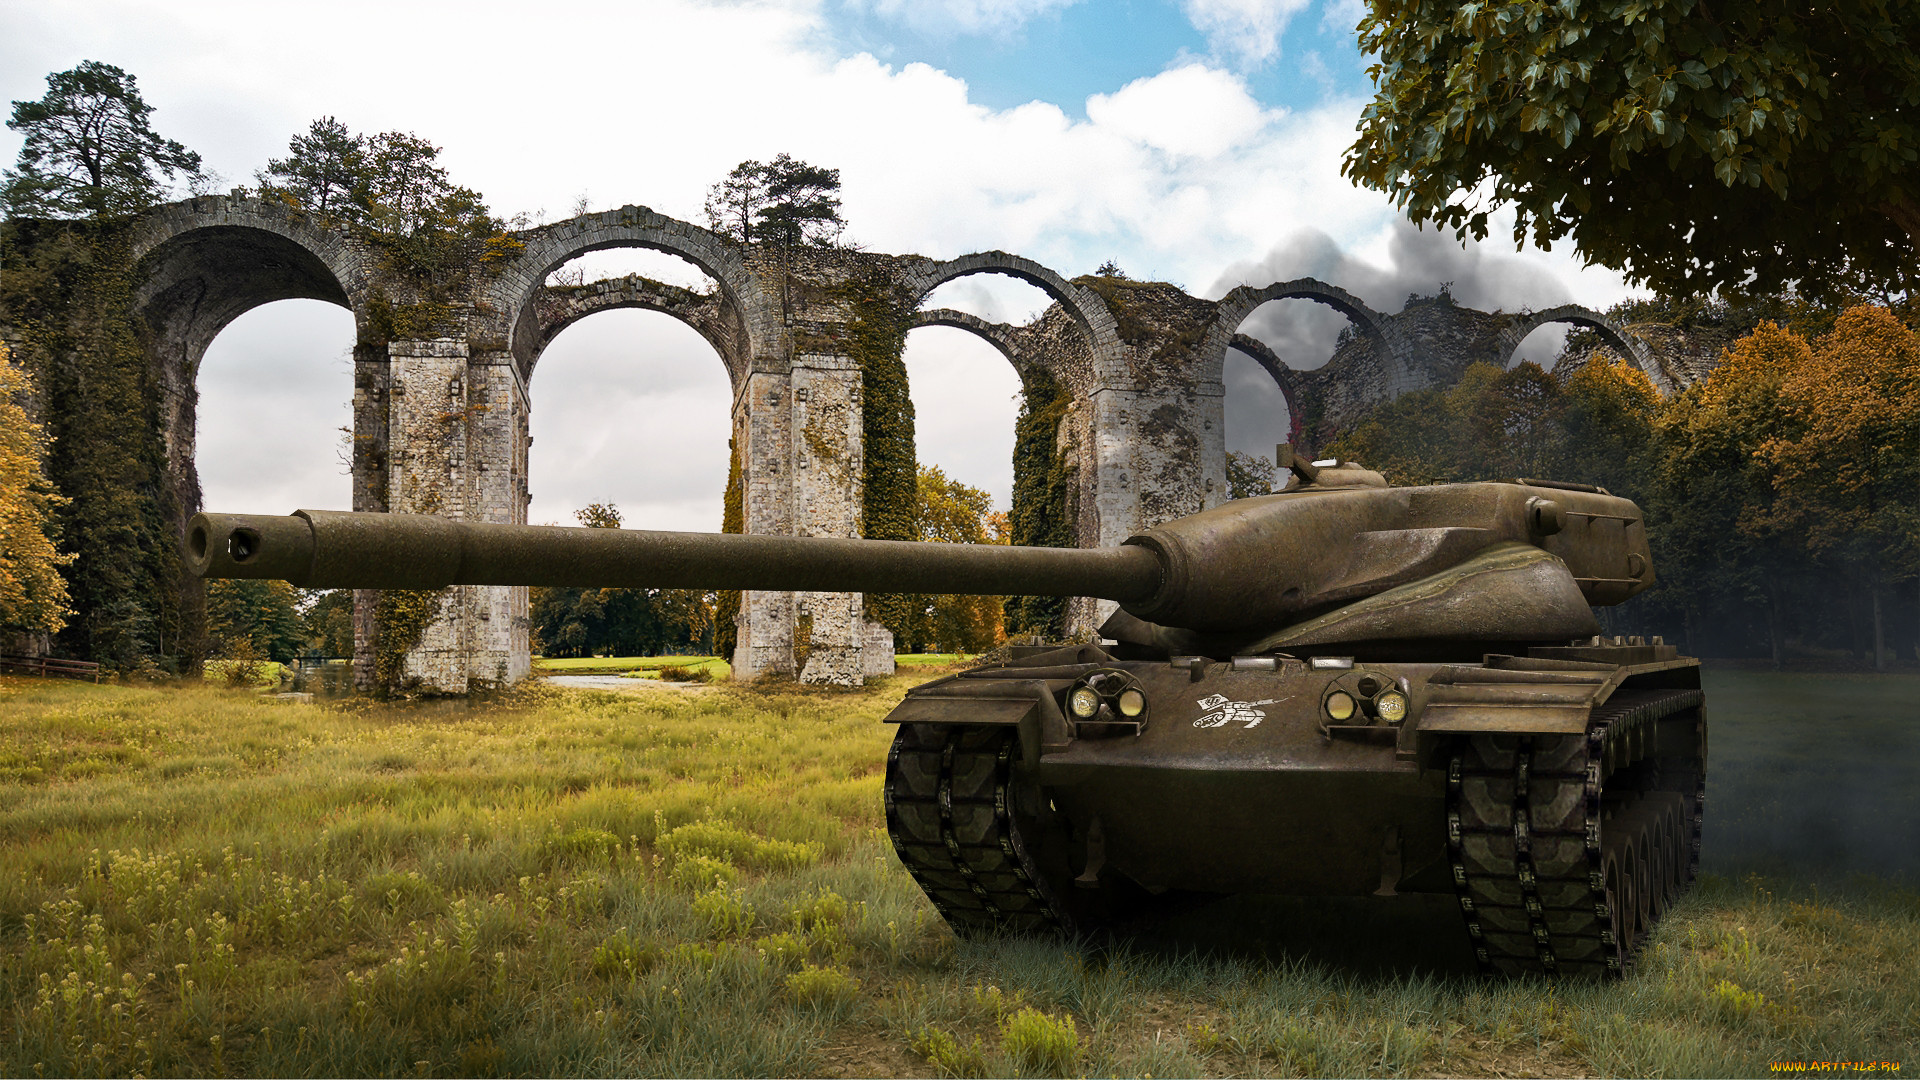 озере танк картинки в мир танков видите, фото